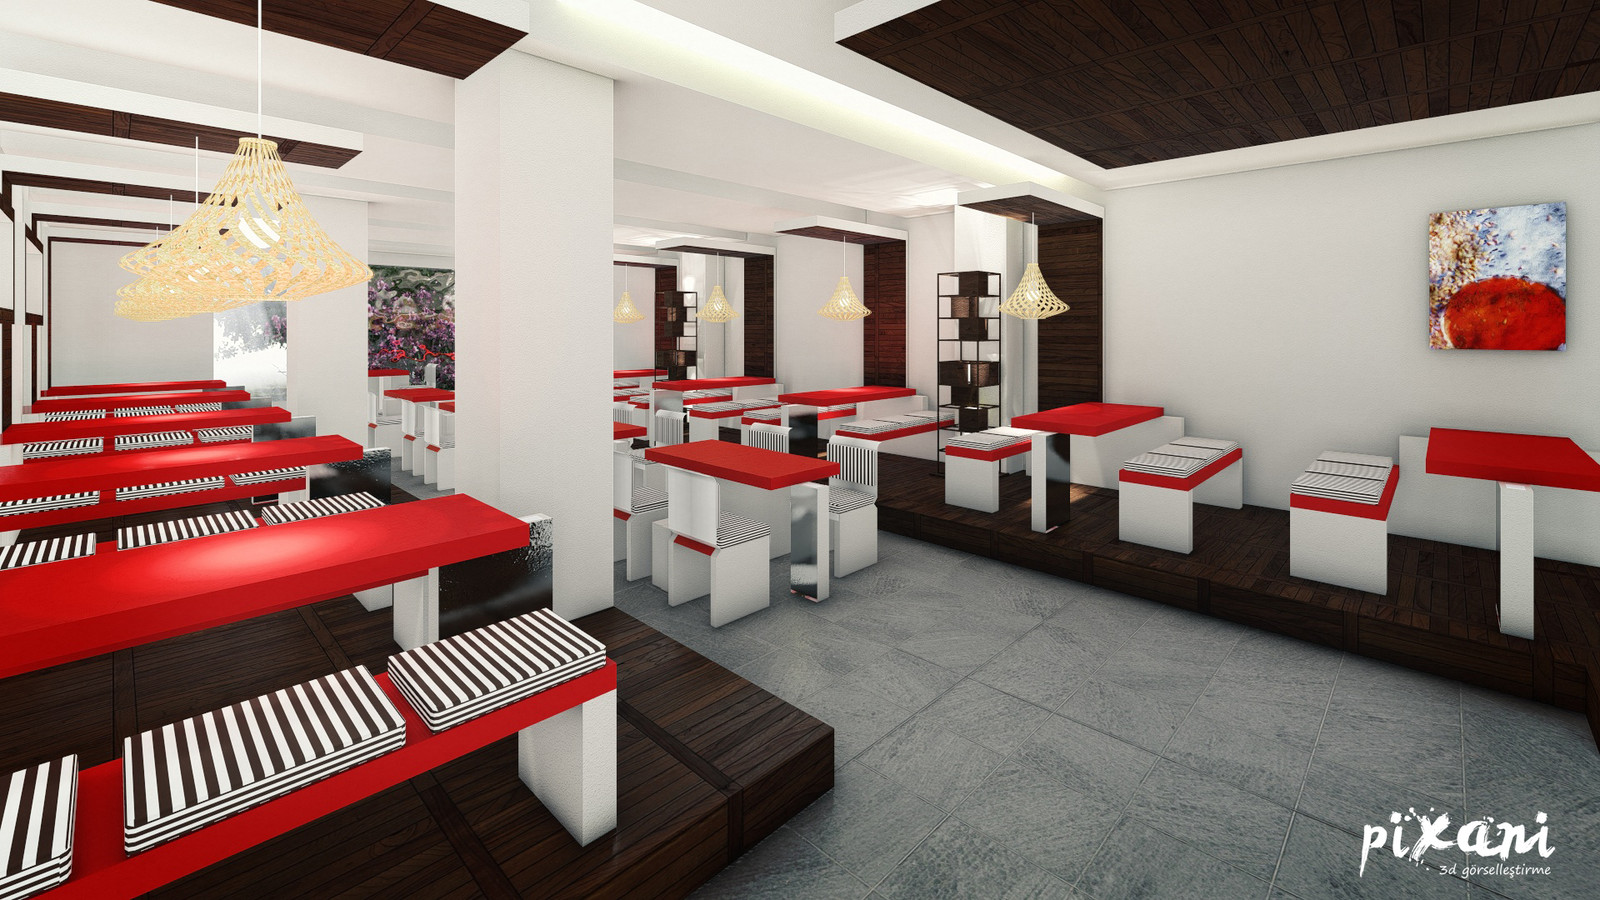 First Dining Hall of Karebant KAREBANT REFECTORY